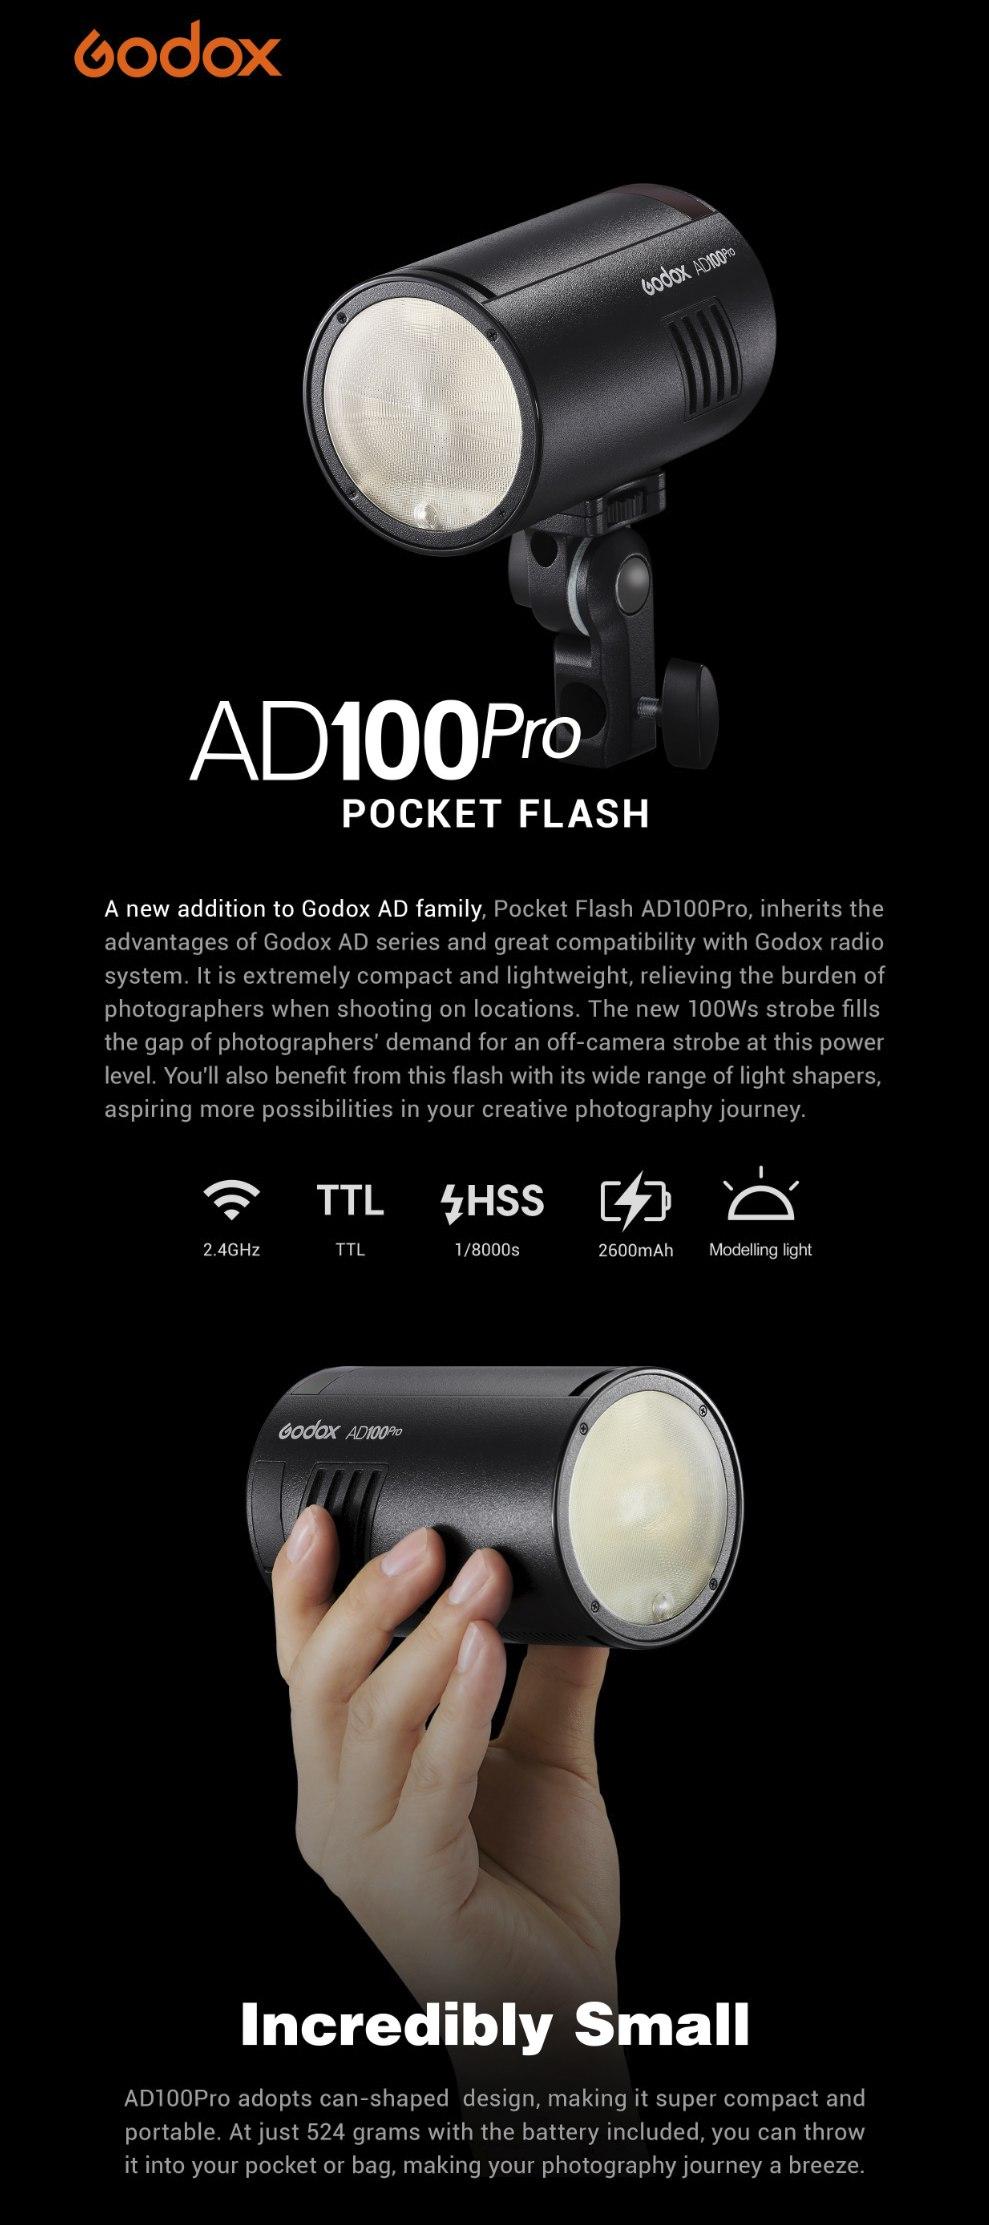 Godox AD100Pro Pocket Flash Incredibly Small